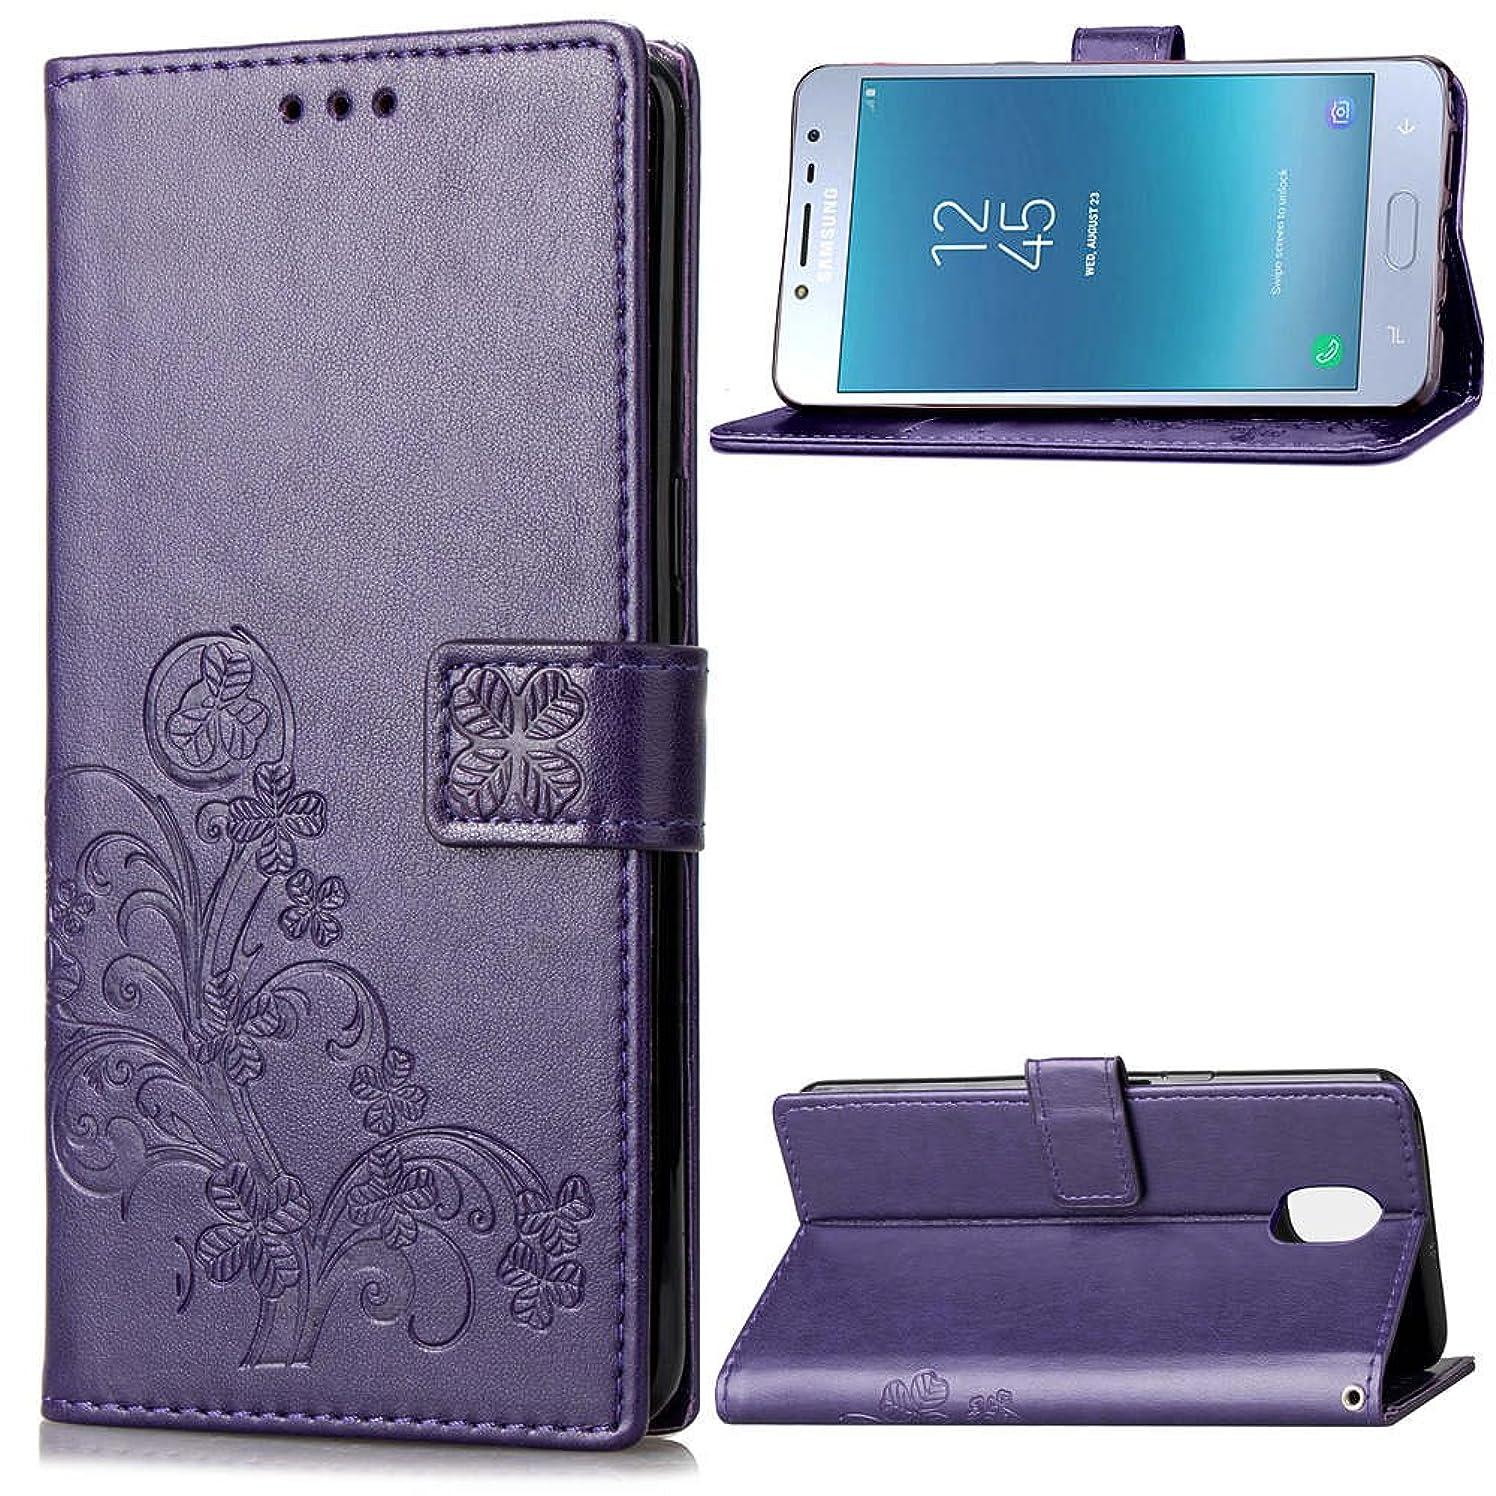 Galaxy J7 V 2nd Gen Case, J7 Wallet Flip Case Kickstand Card Slots 3D Embossed Clover Flowers PU Leather Wallet Case Shockproof Soft TPU Inner Bumper Slim Protective Cover for Samsung Galaxy J7 2018